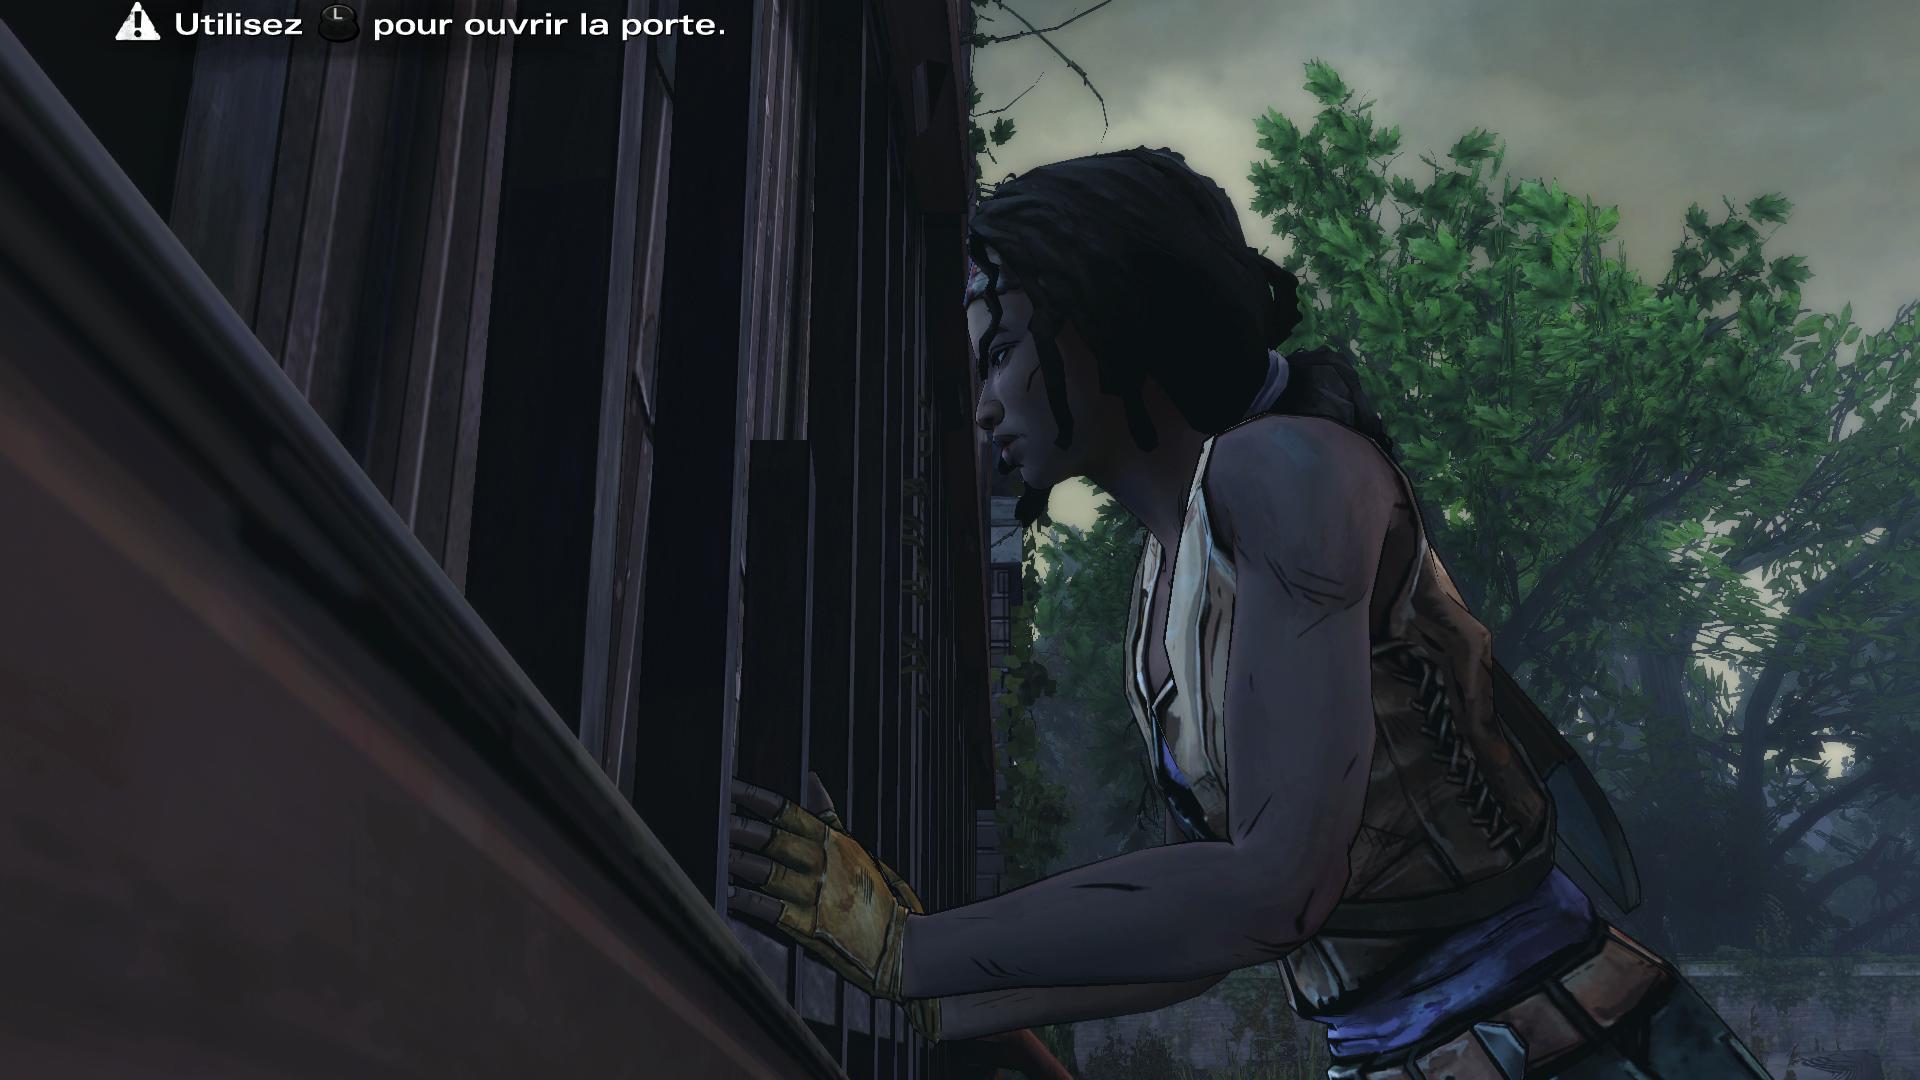 The Walking Dead: Michonne: Episode 3 - What We Deserve Xbox